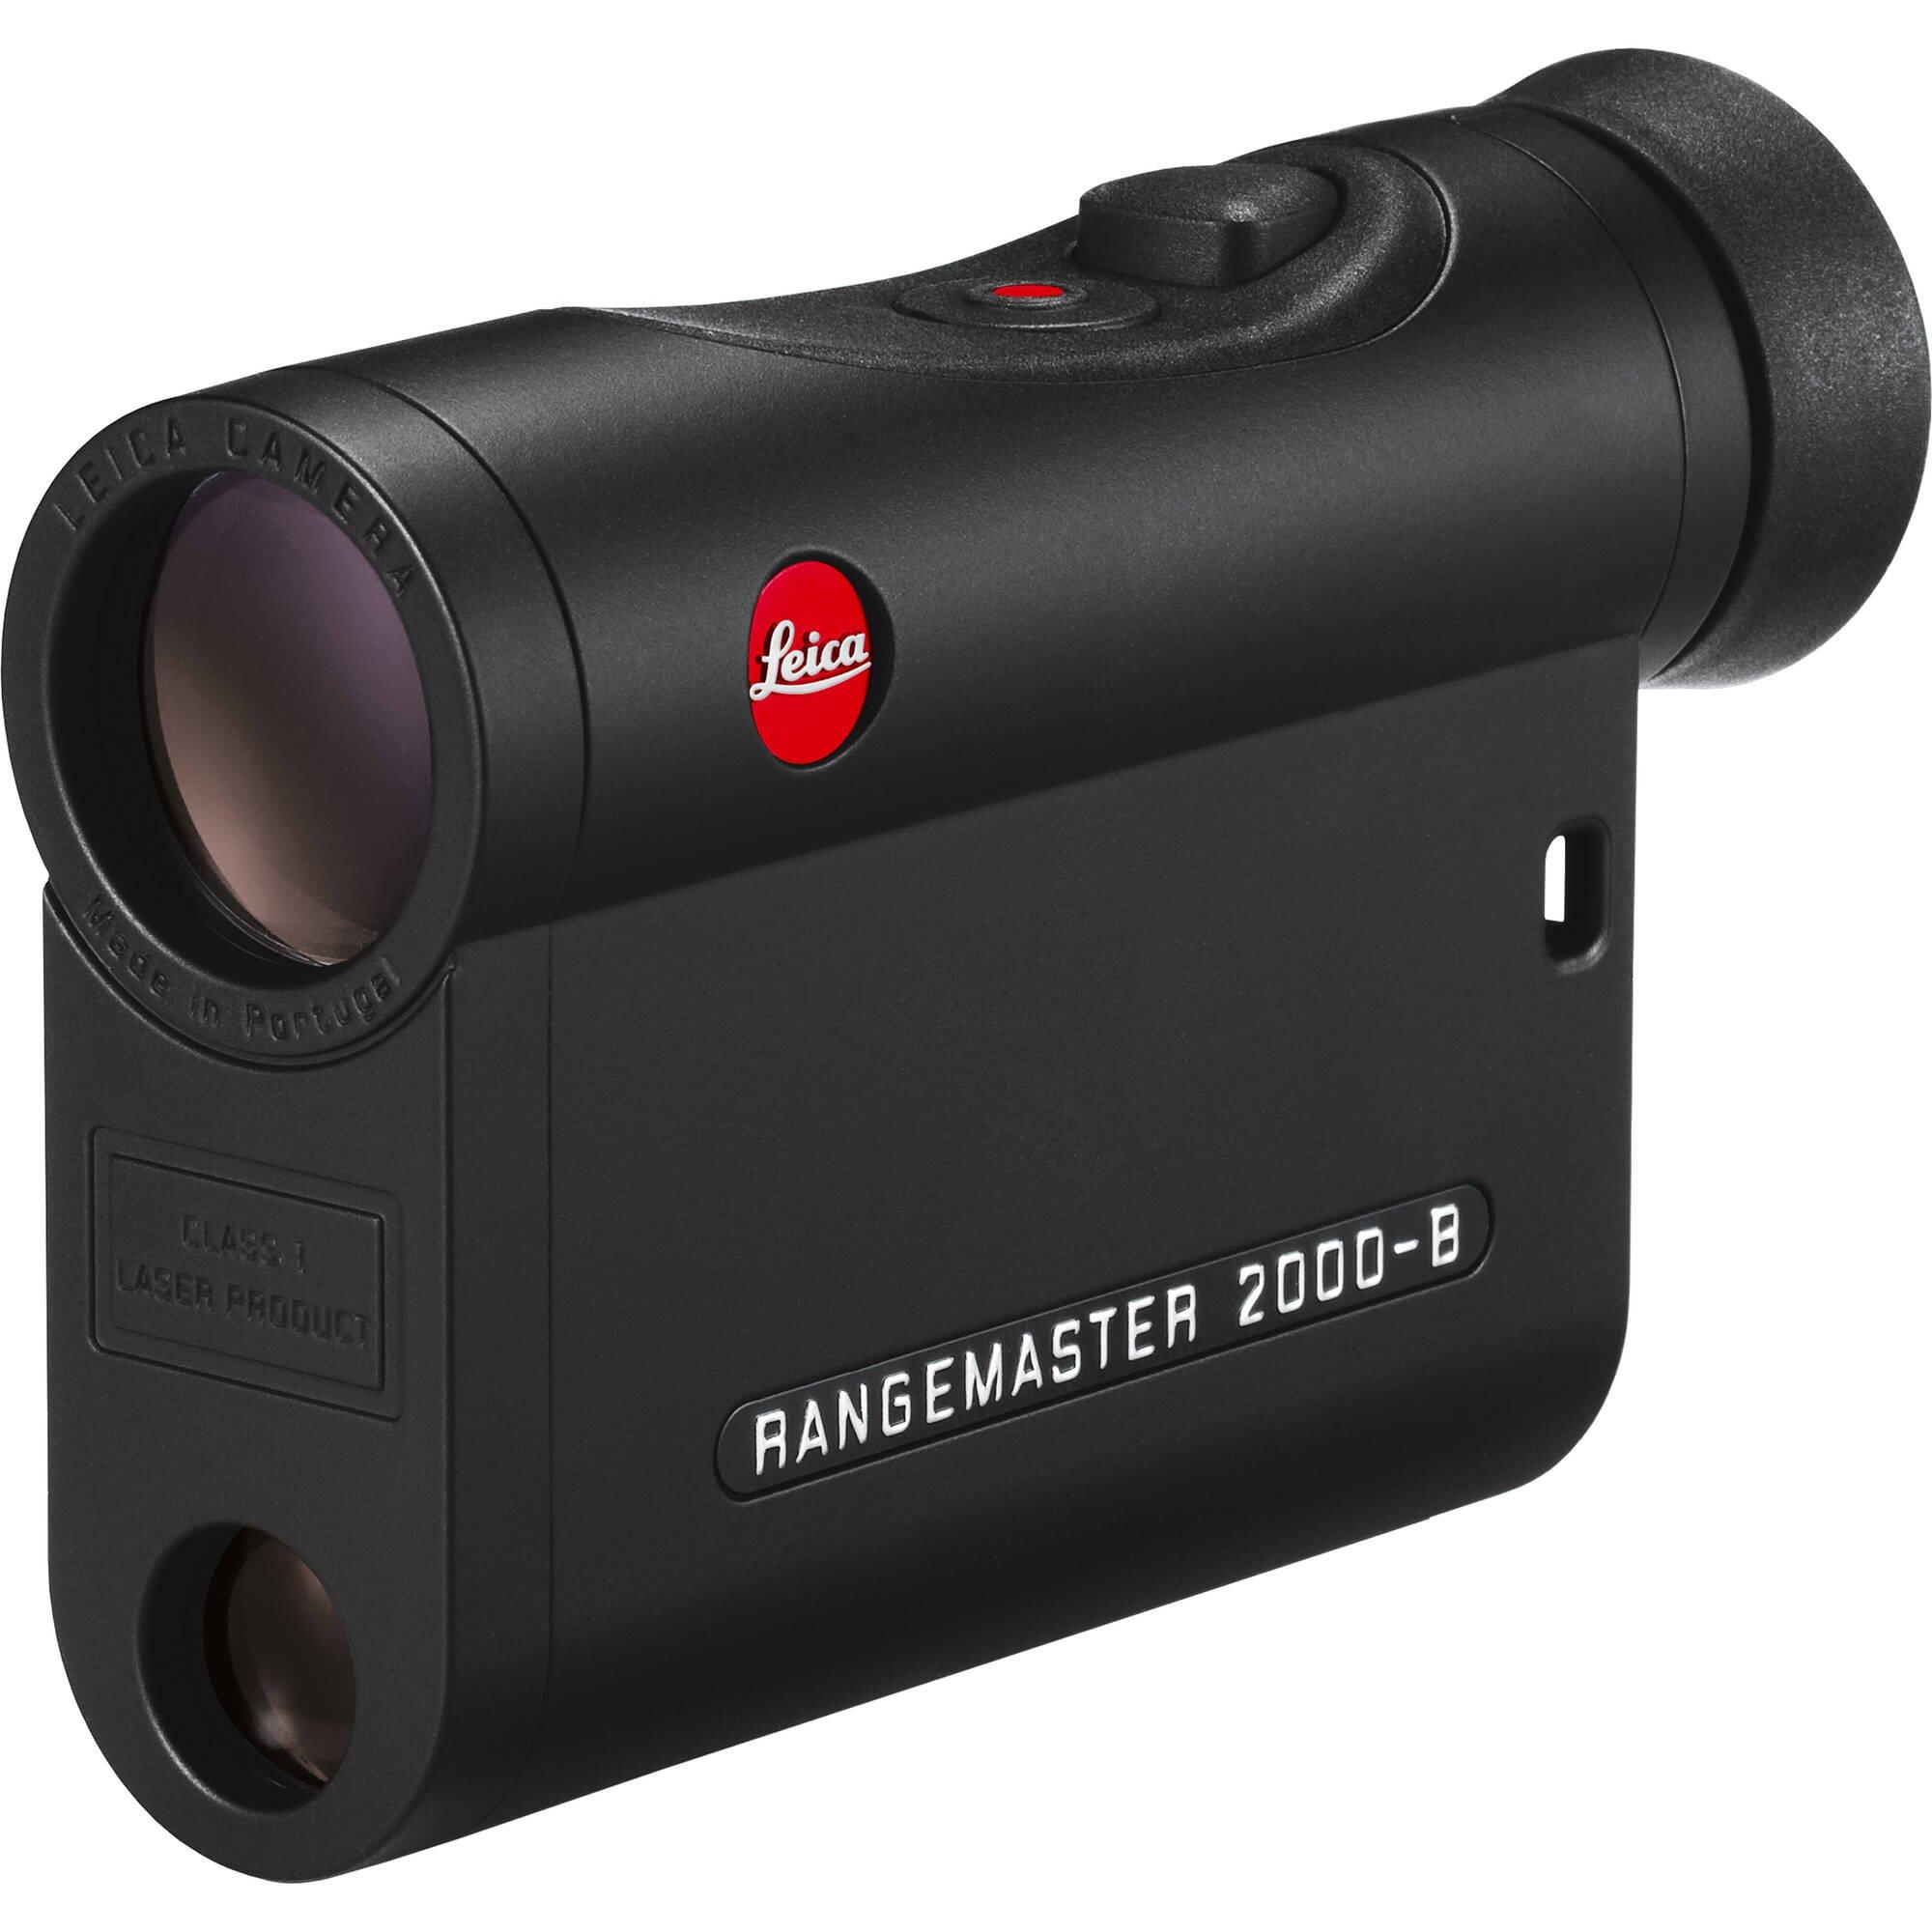 LEICA RANGEMASTER CRF 2000-B 40536